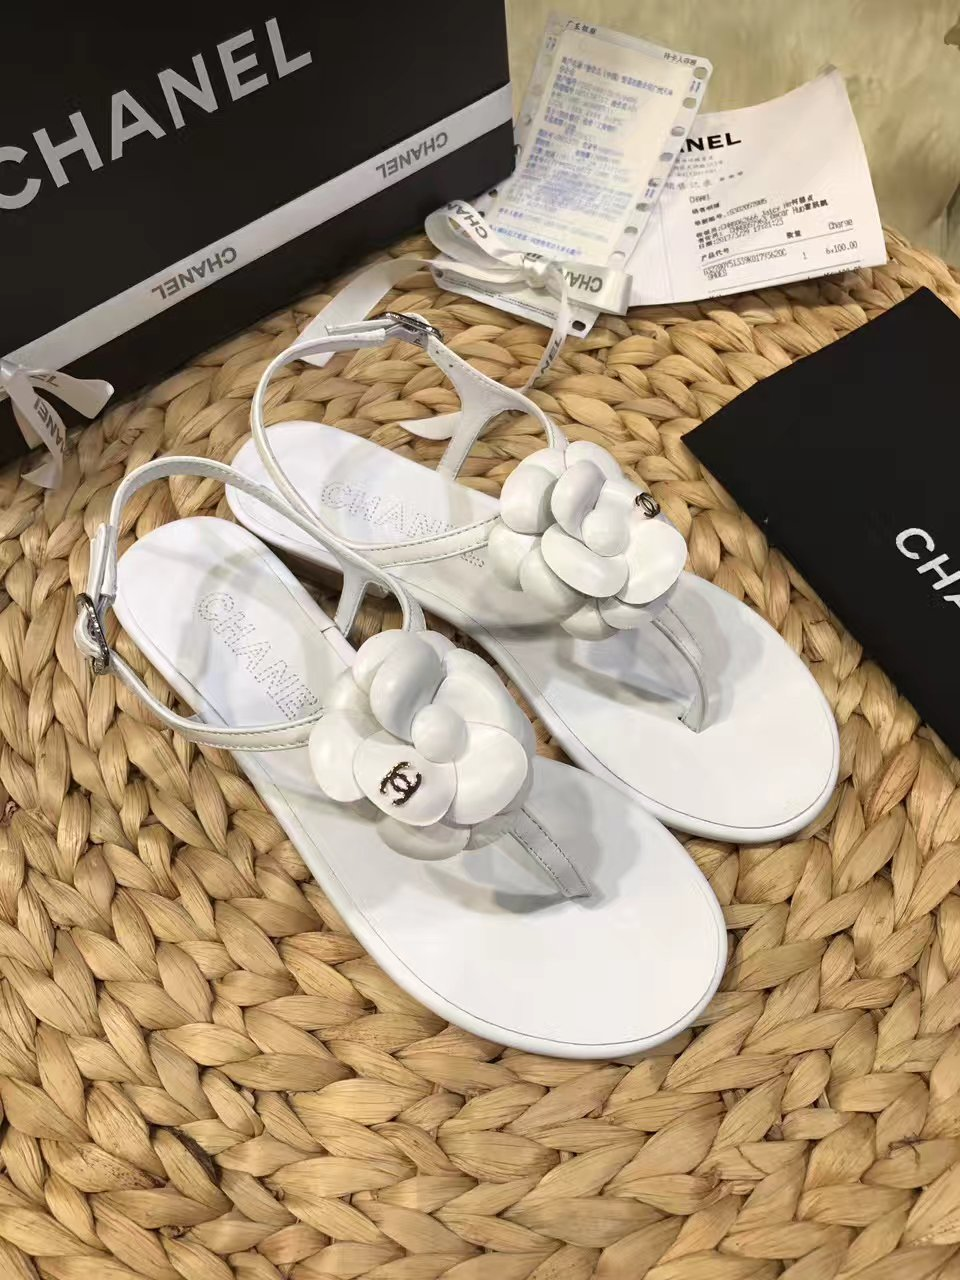 【Chanel香奈儿凉鞋】山茶花珠片凉鞋